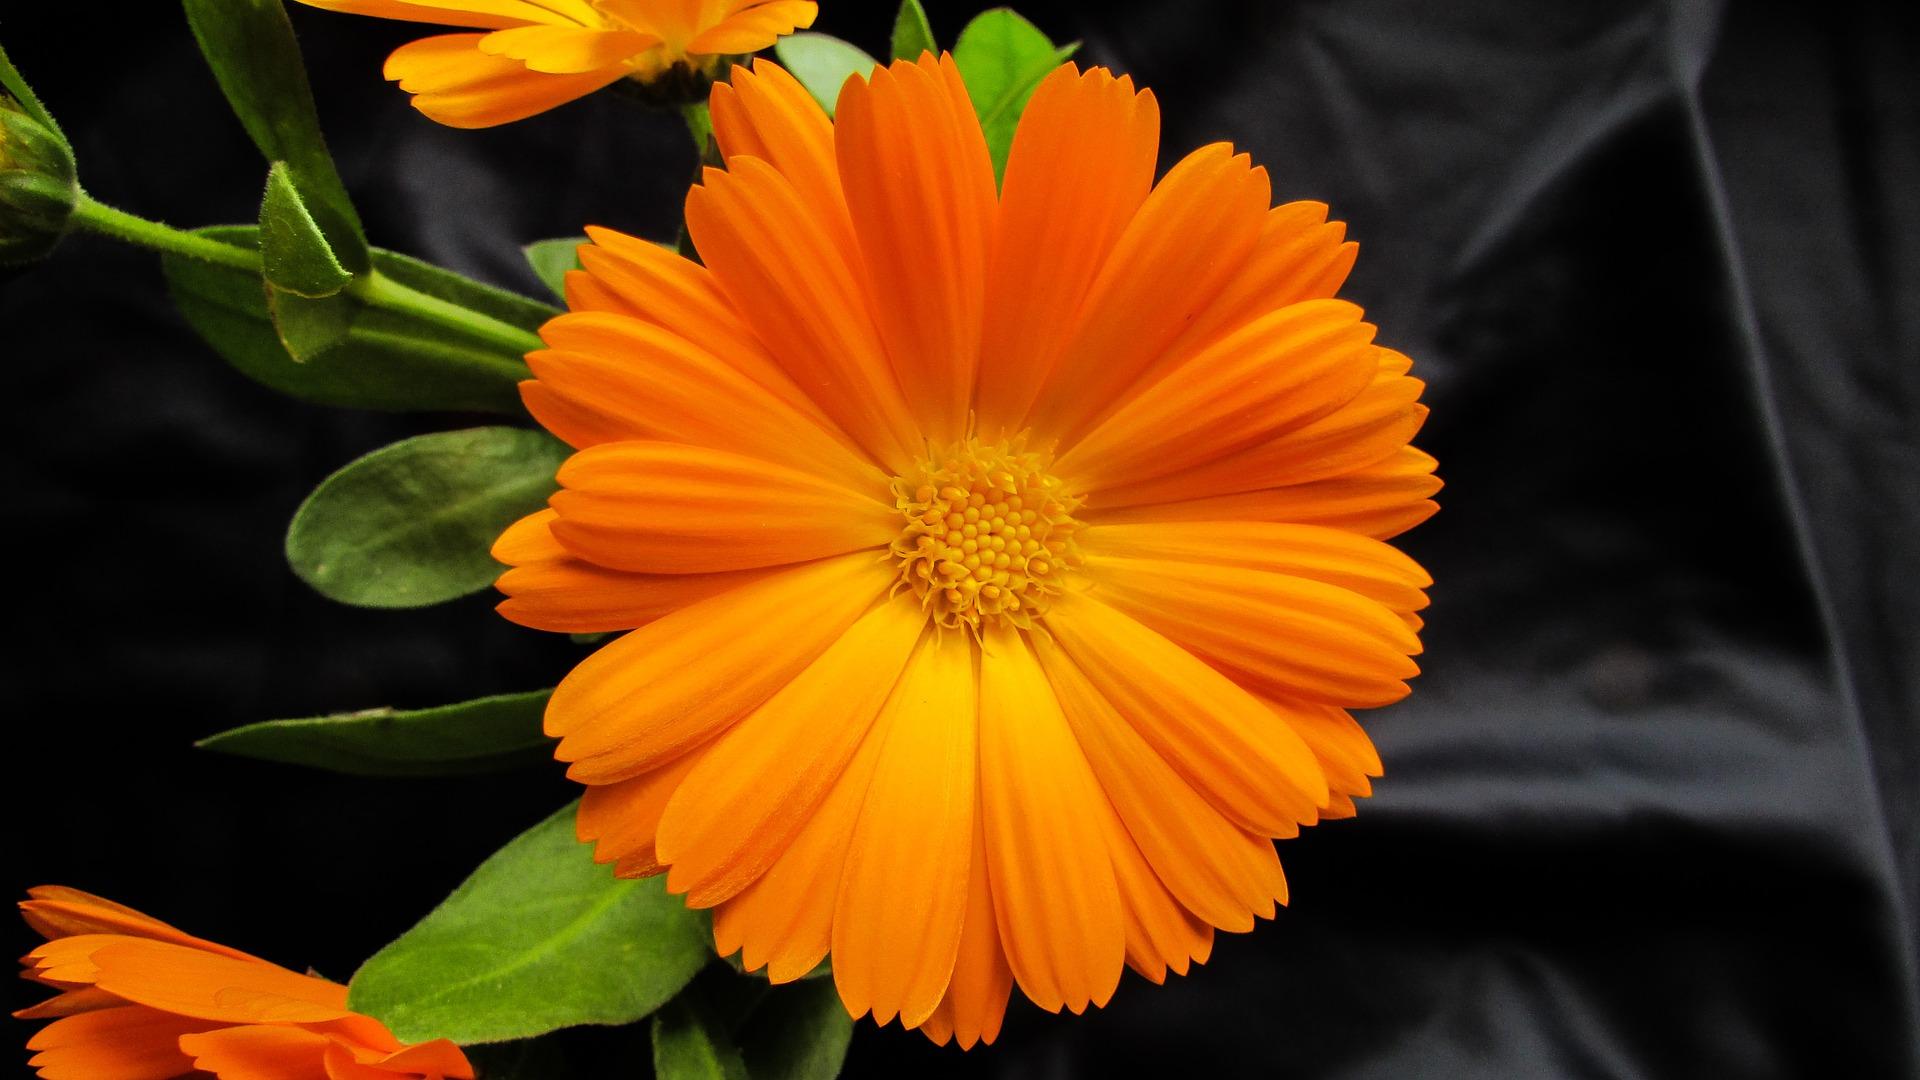 marigold 1199959 1920